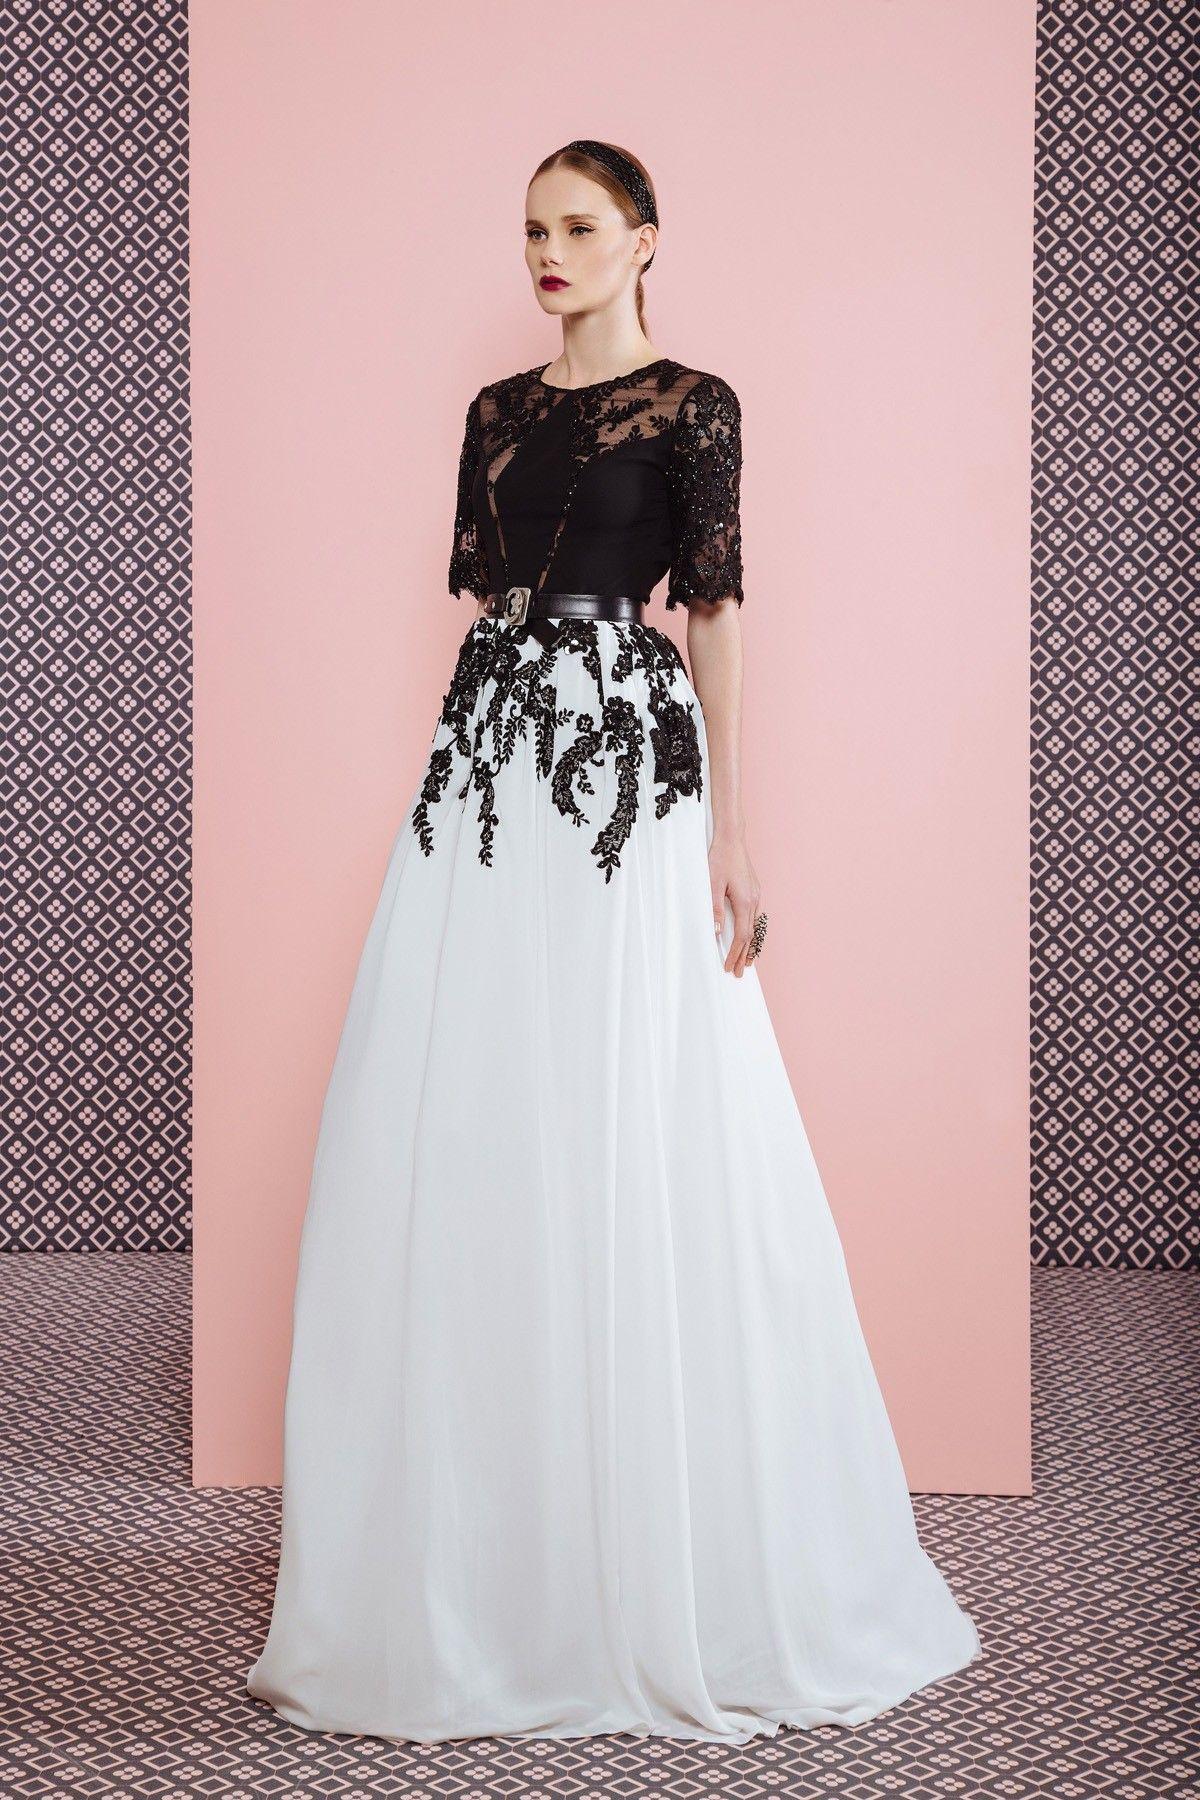 DISEÑO ELEGANTE   Dress   Pinterest   Elegante, Ropa elegante y ...